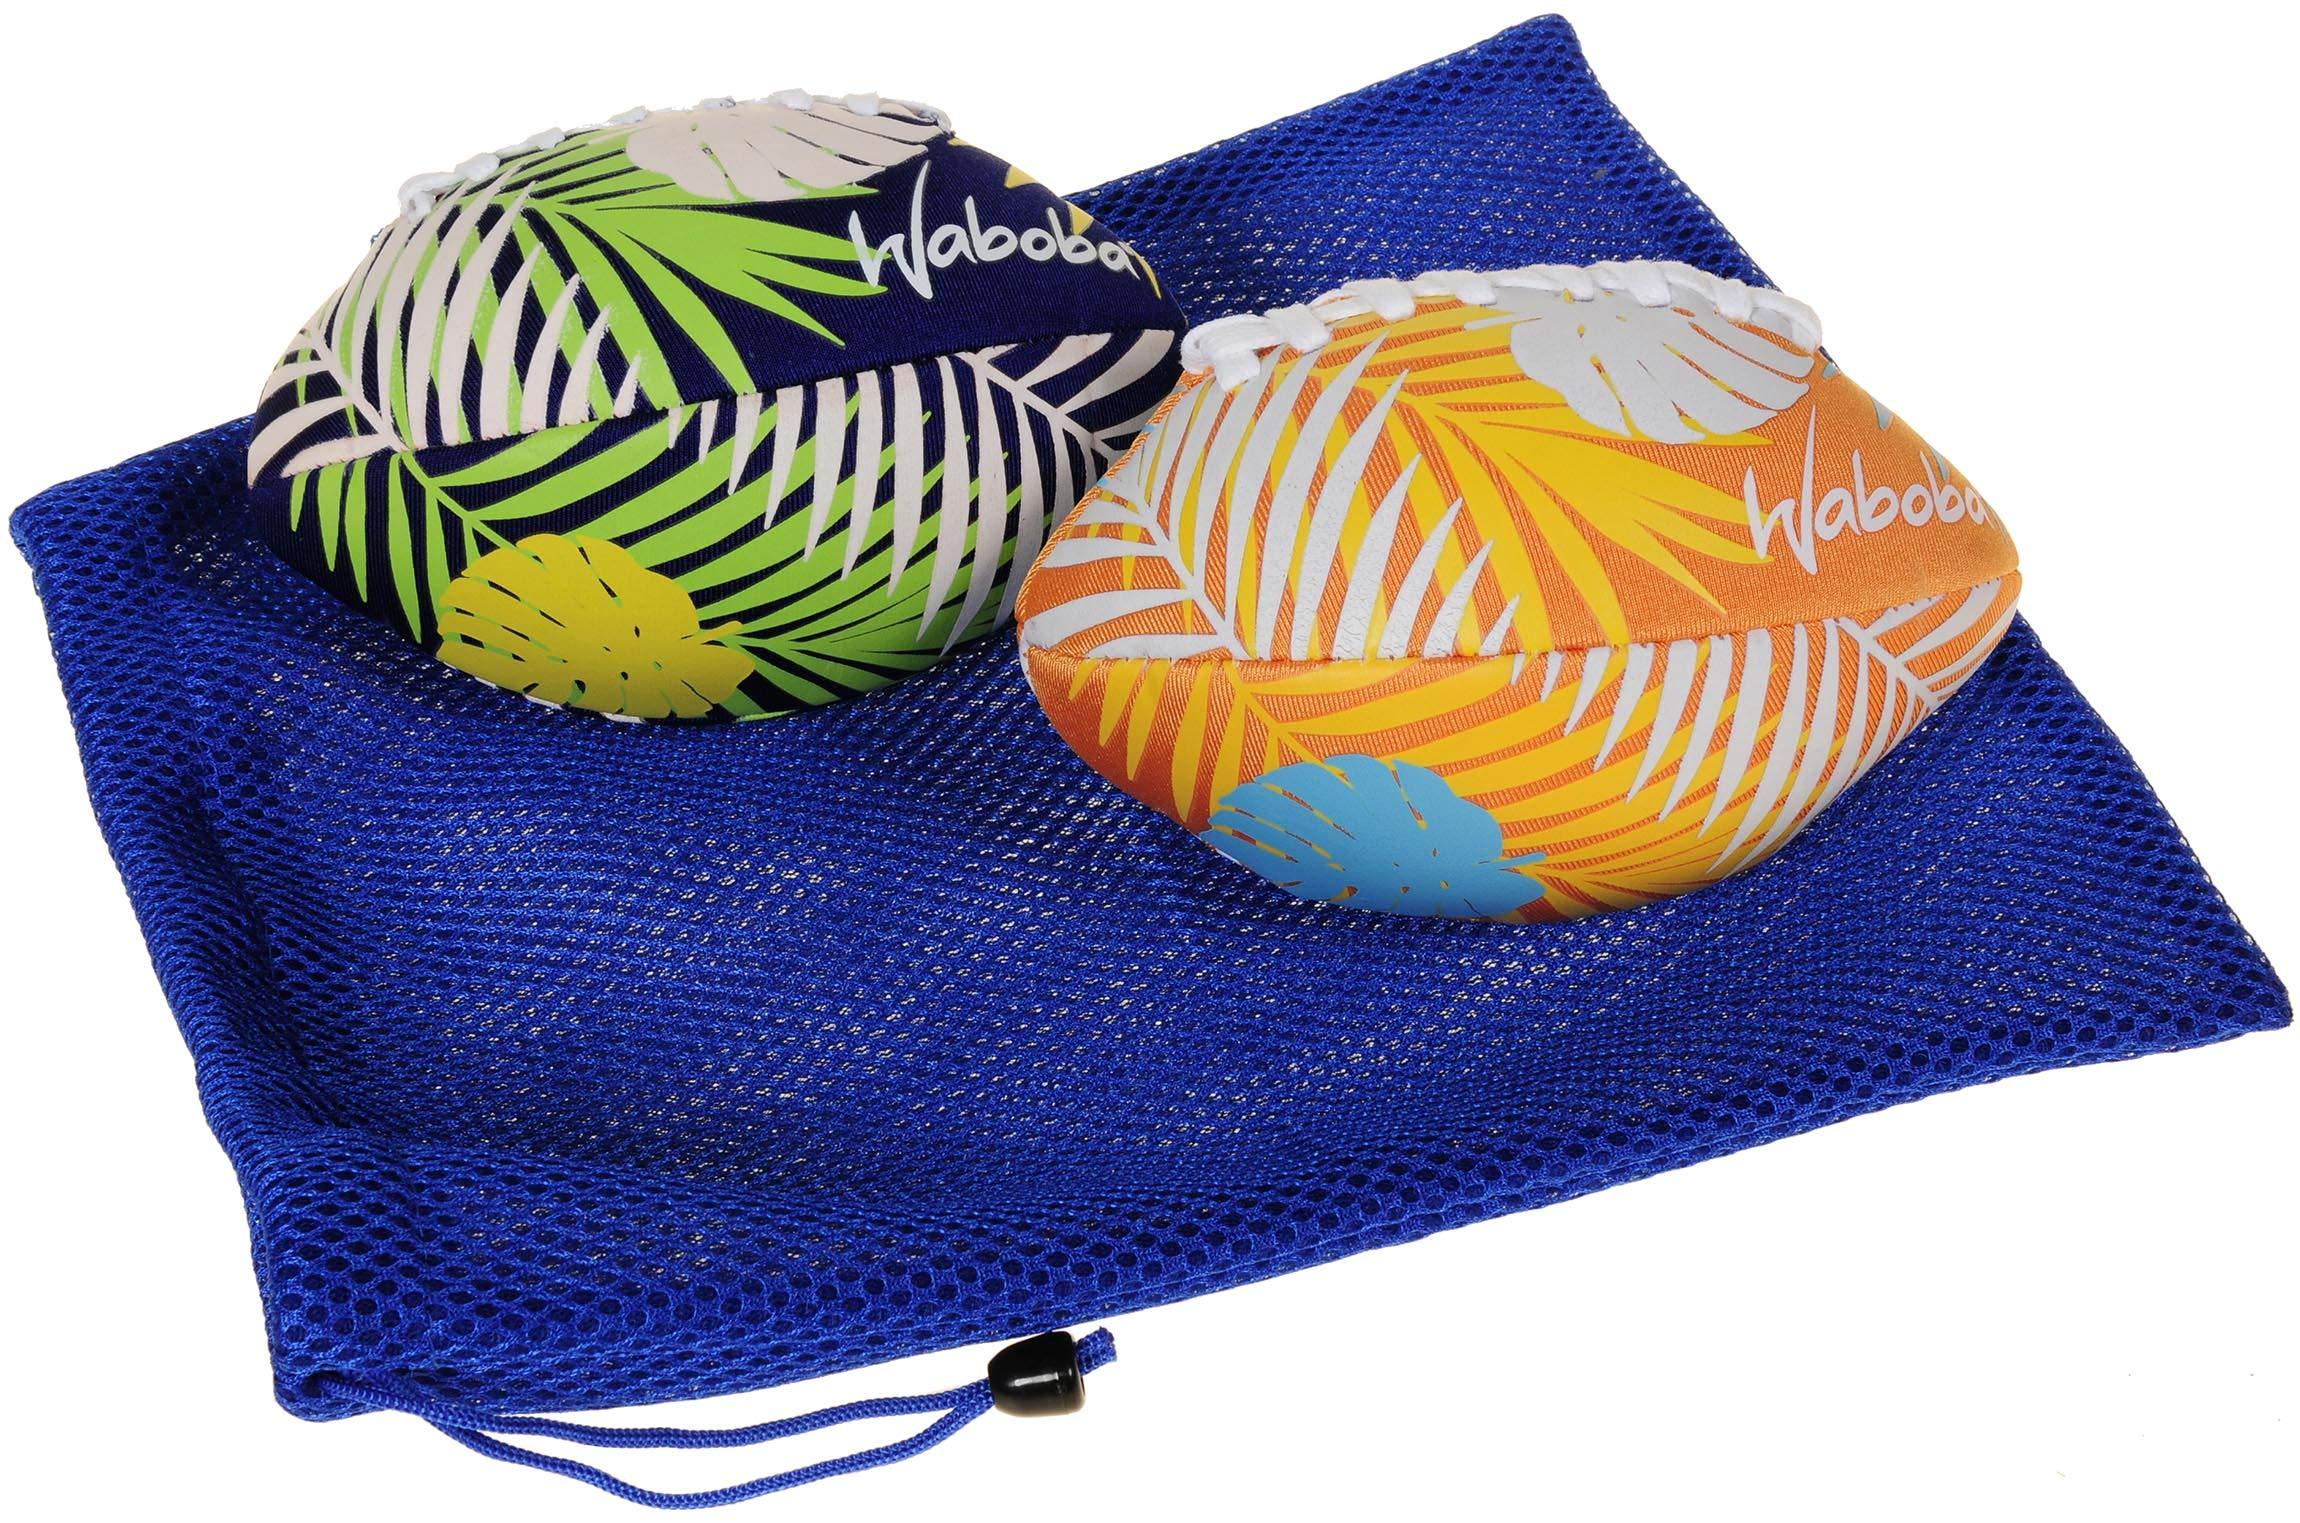 Waboba Color Changing Water Football 6'' // Bundle of 2 Footballs (Random Colors) // Bonus Blue Nylon Mesh Carry Bag// Bundled Items by Waboba (Image #3)